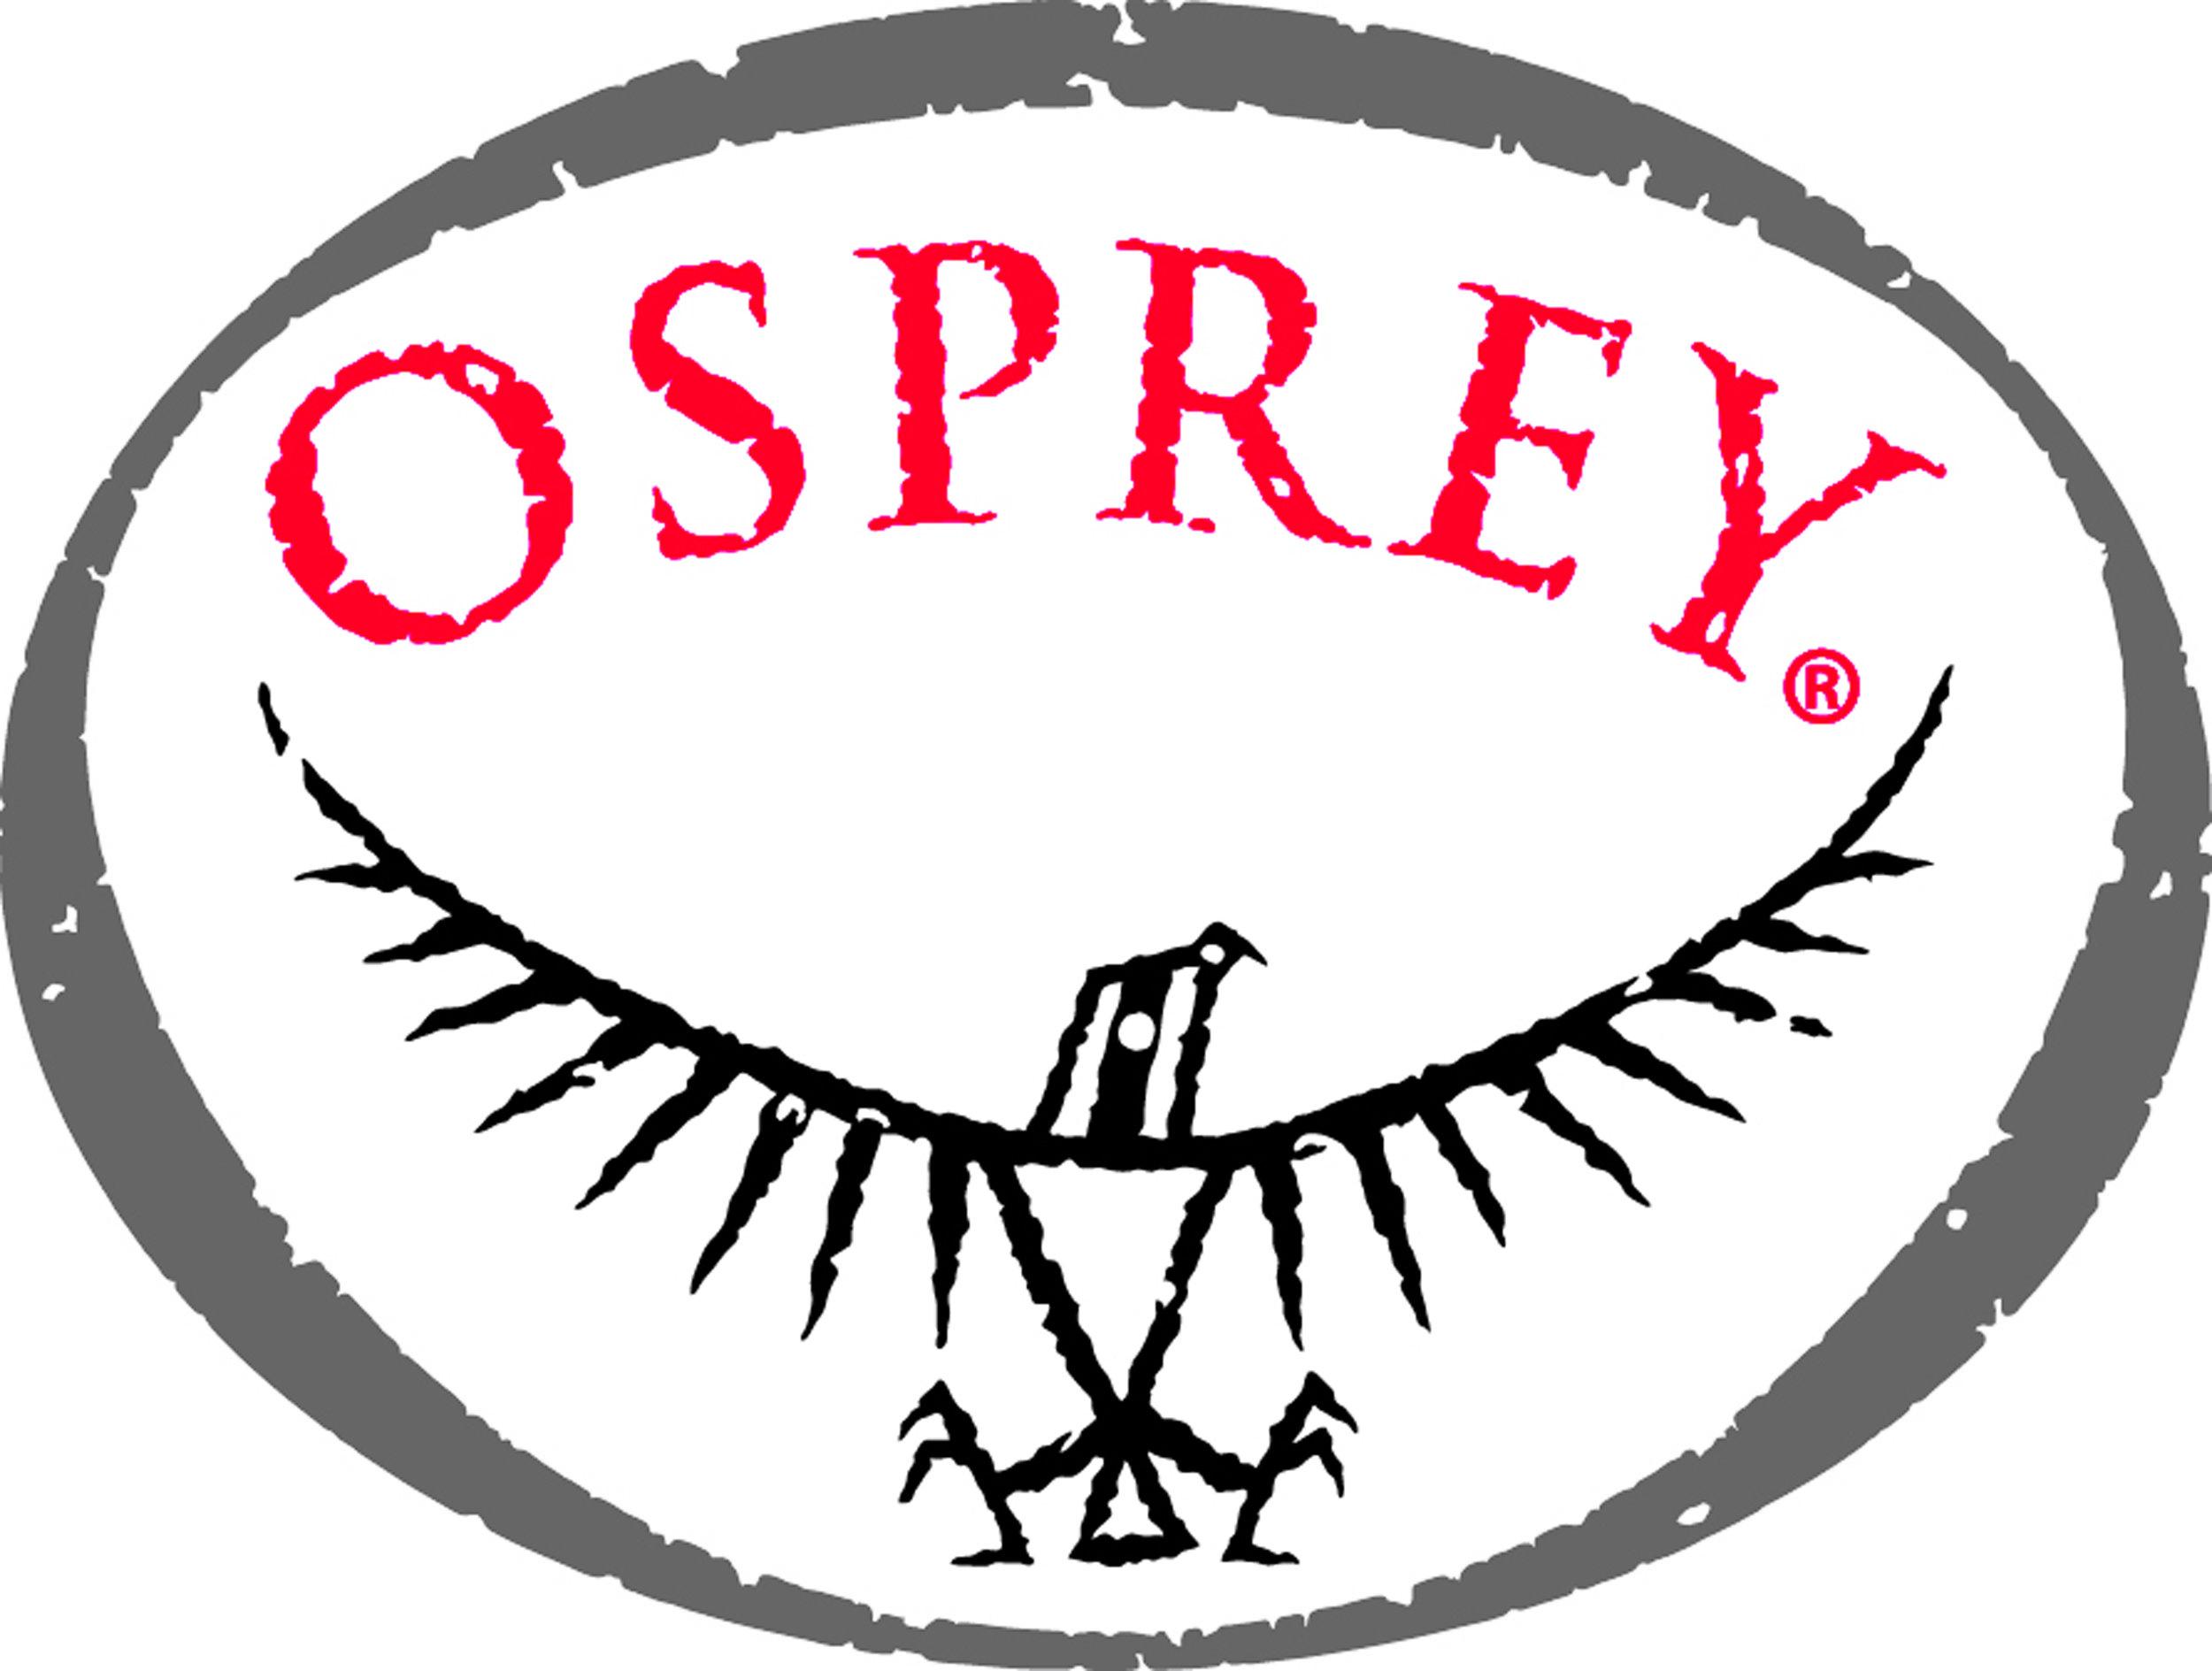 Copy of Osprey Packs